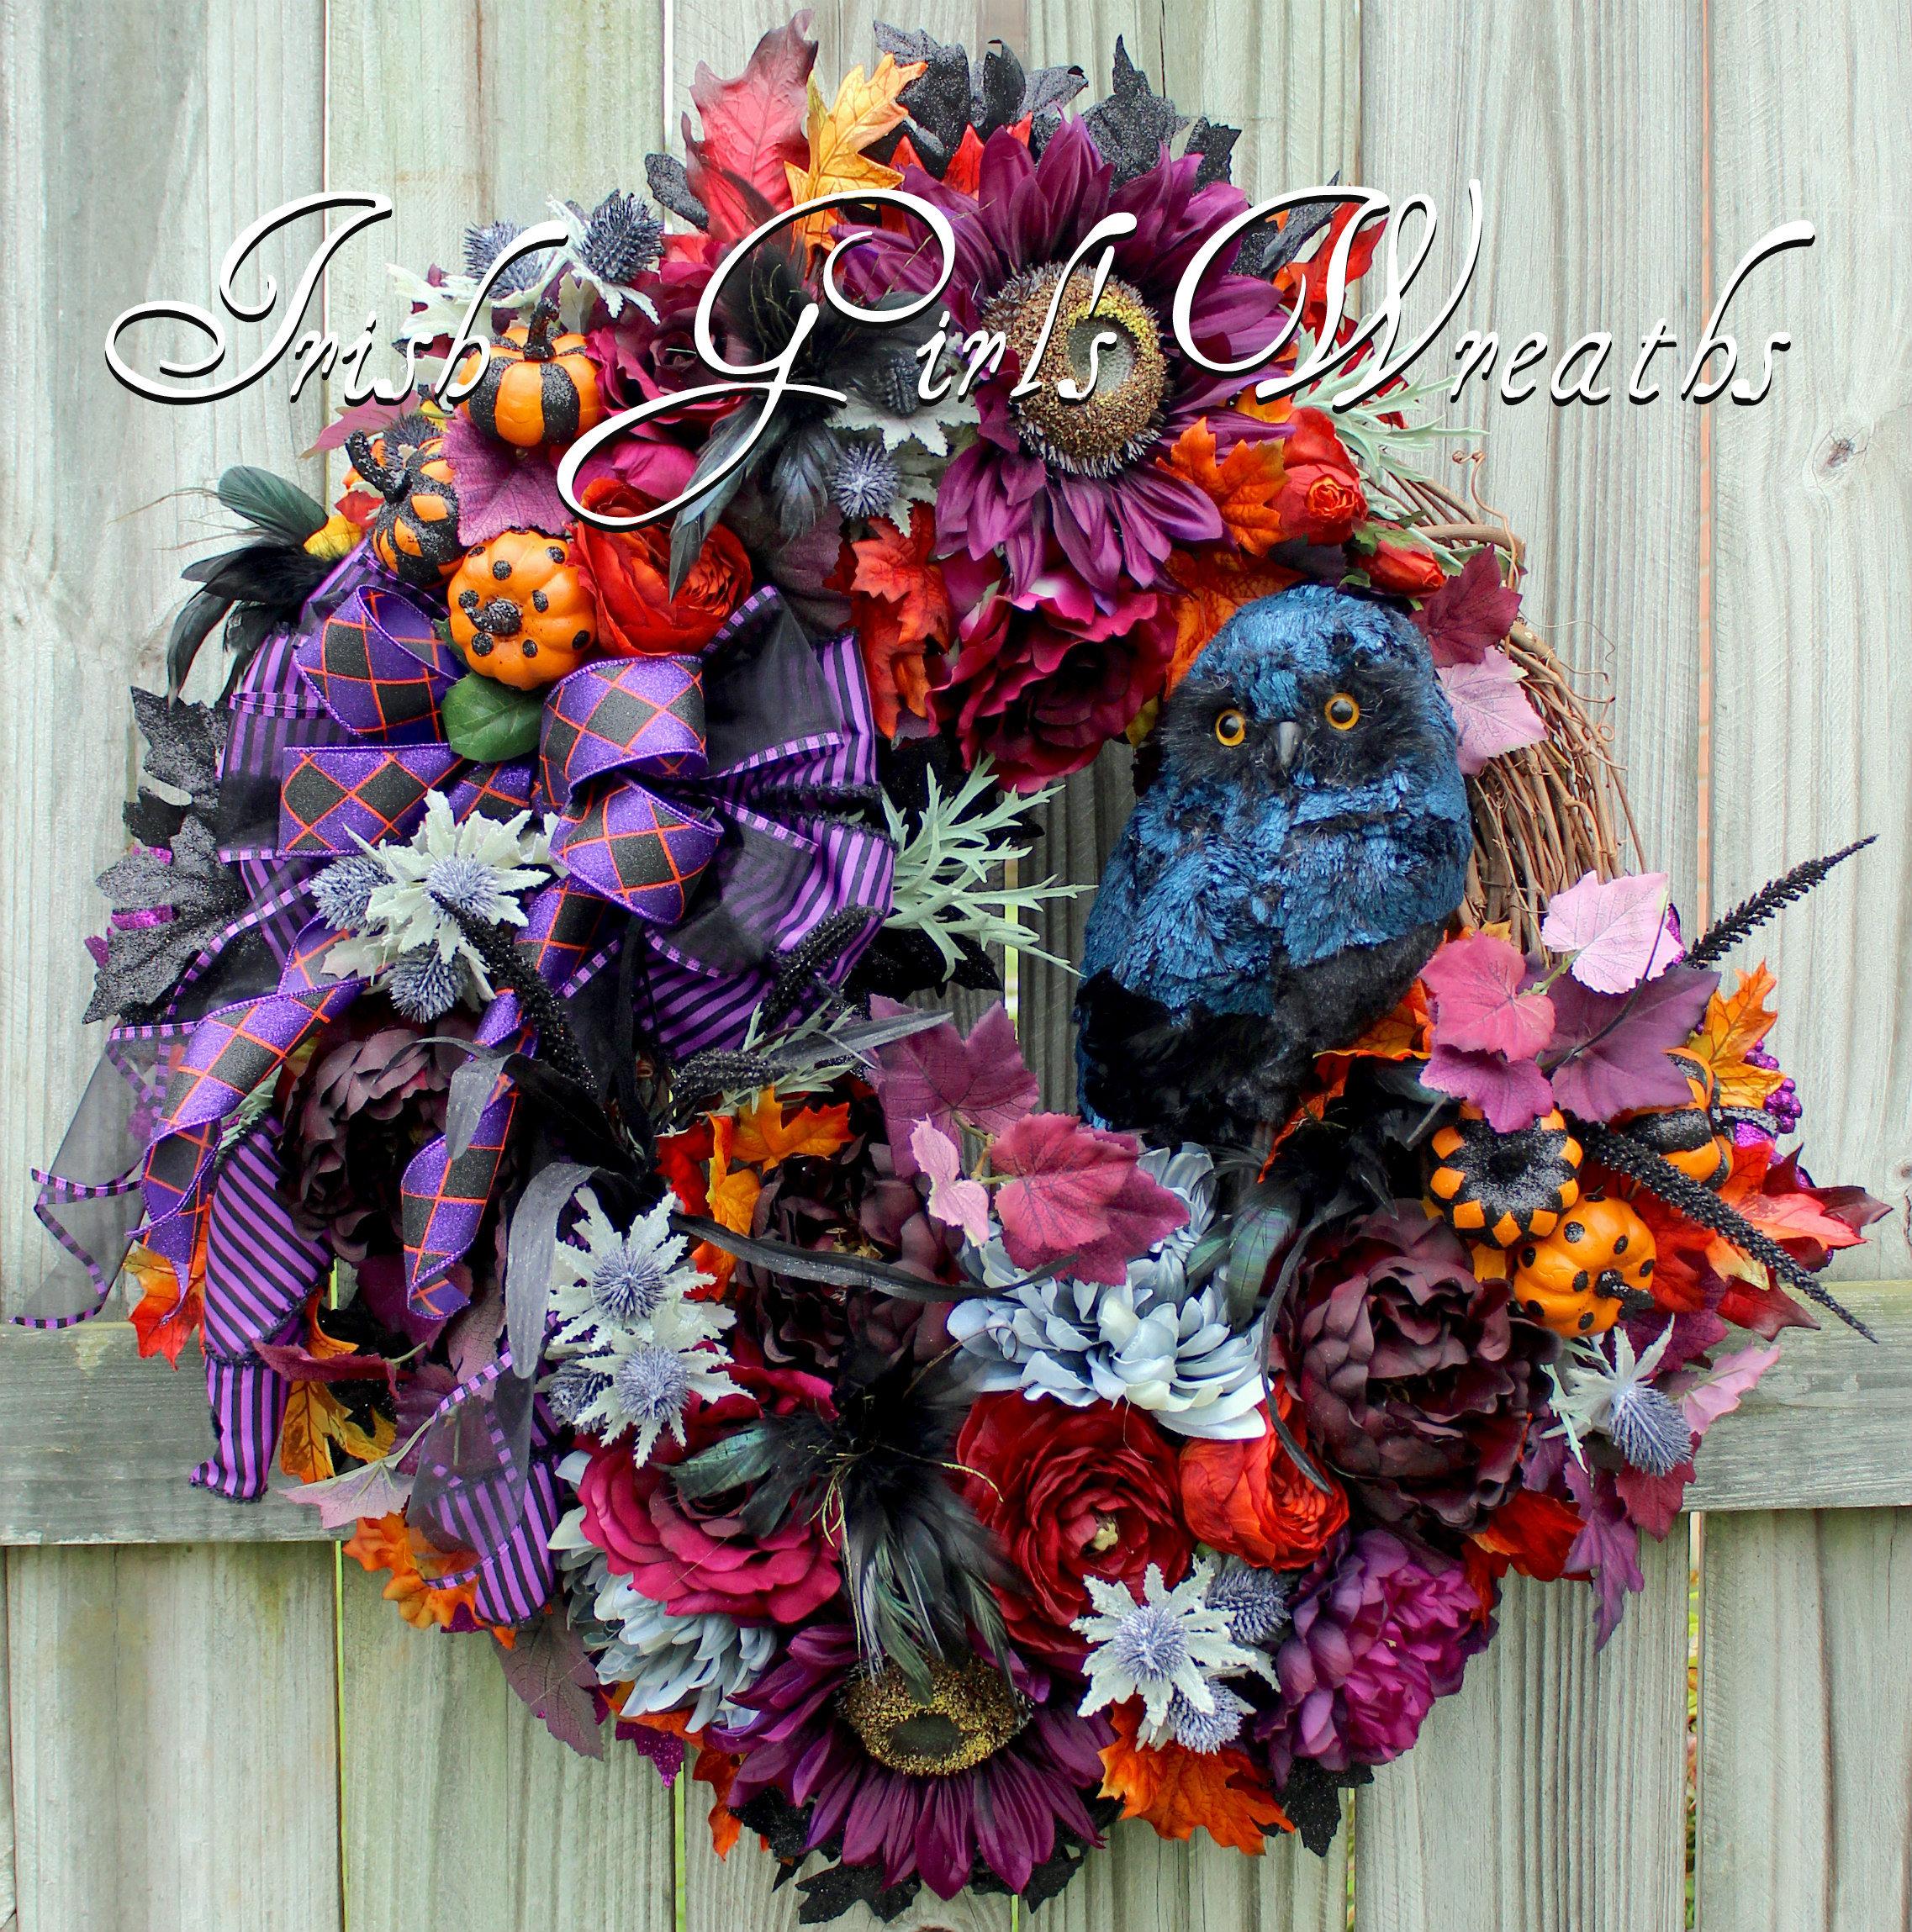 Black Flower And Crow Halloween Wreath: Gothic Halloween Floral Owl Wreath Black Owl Elegant